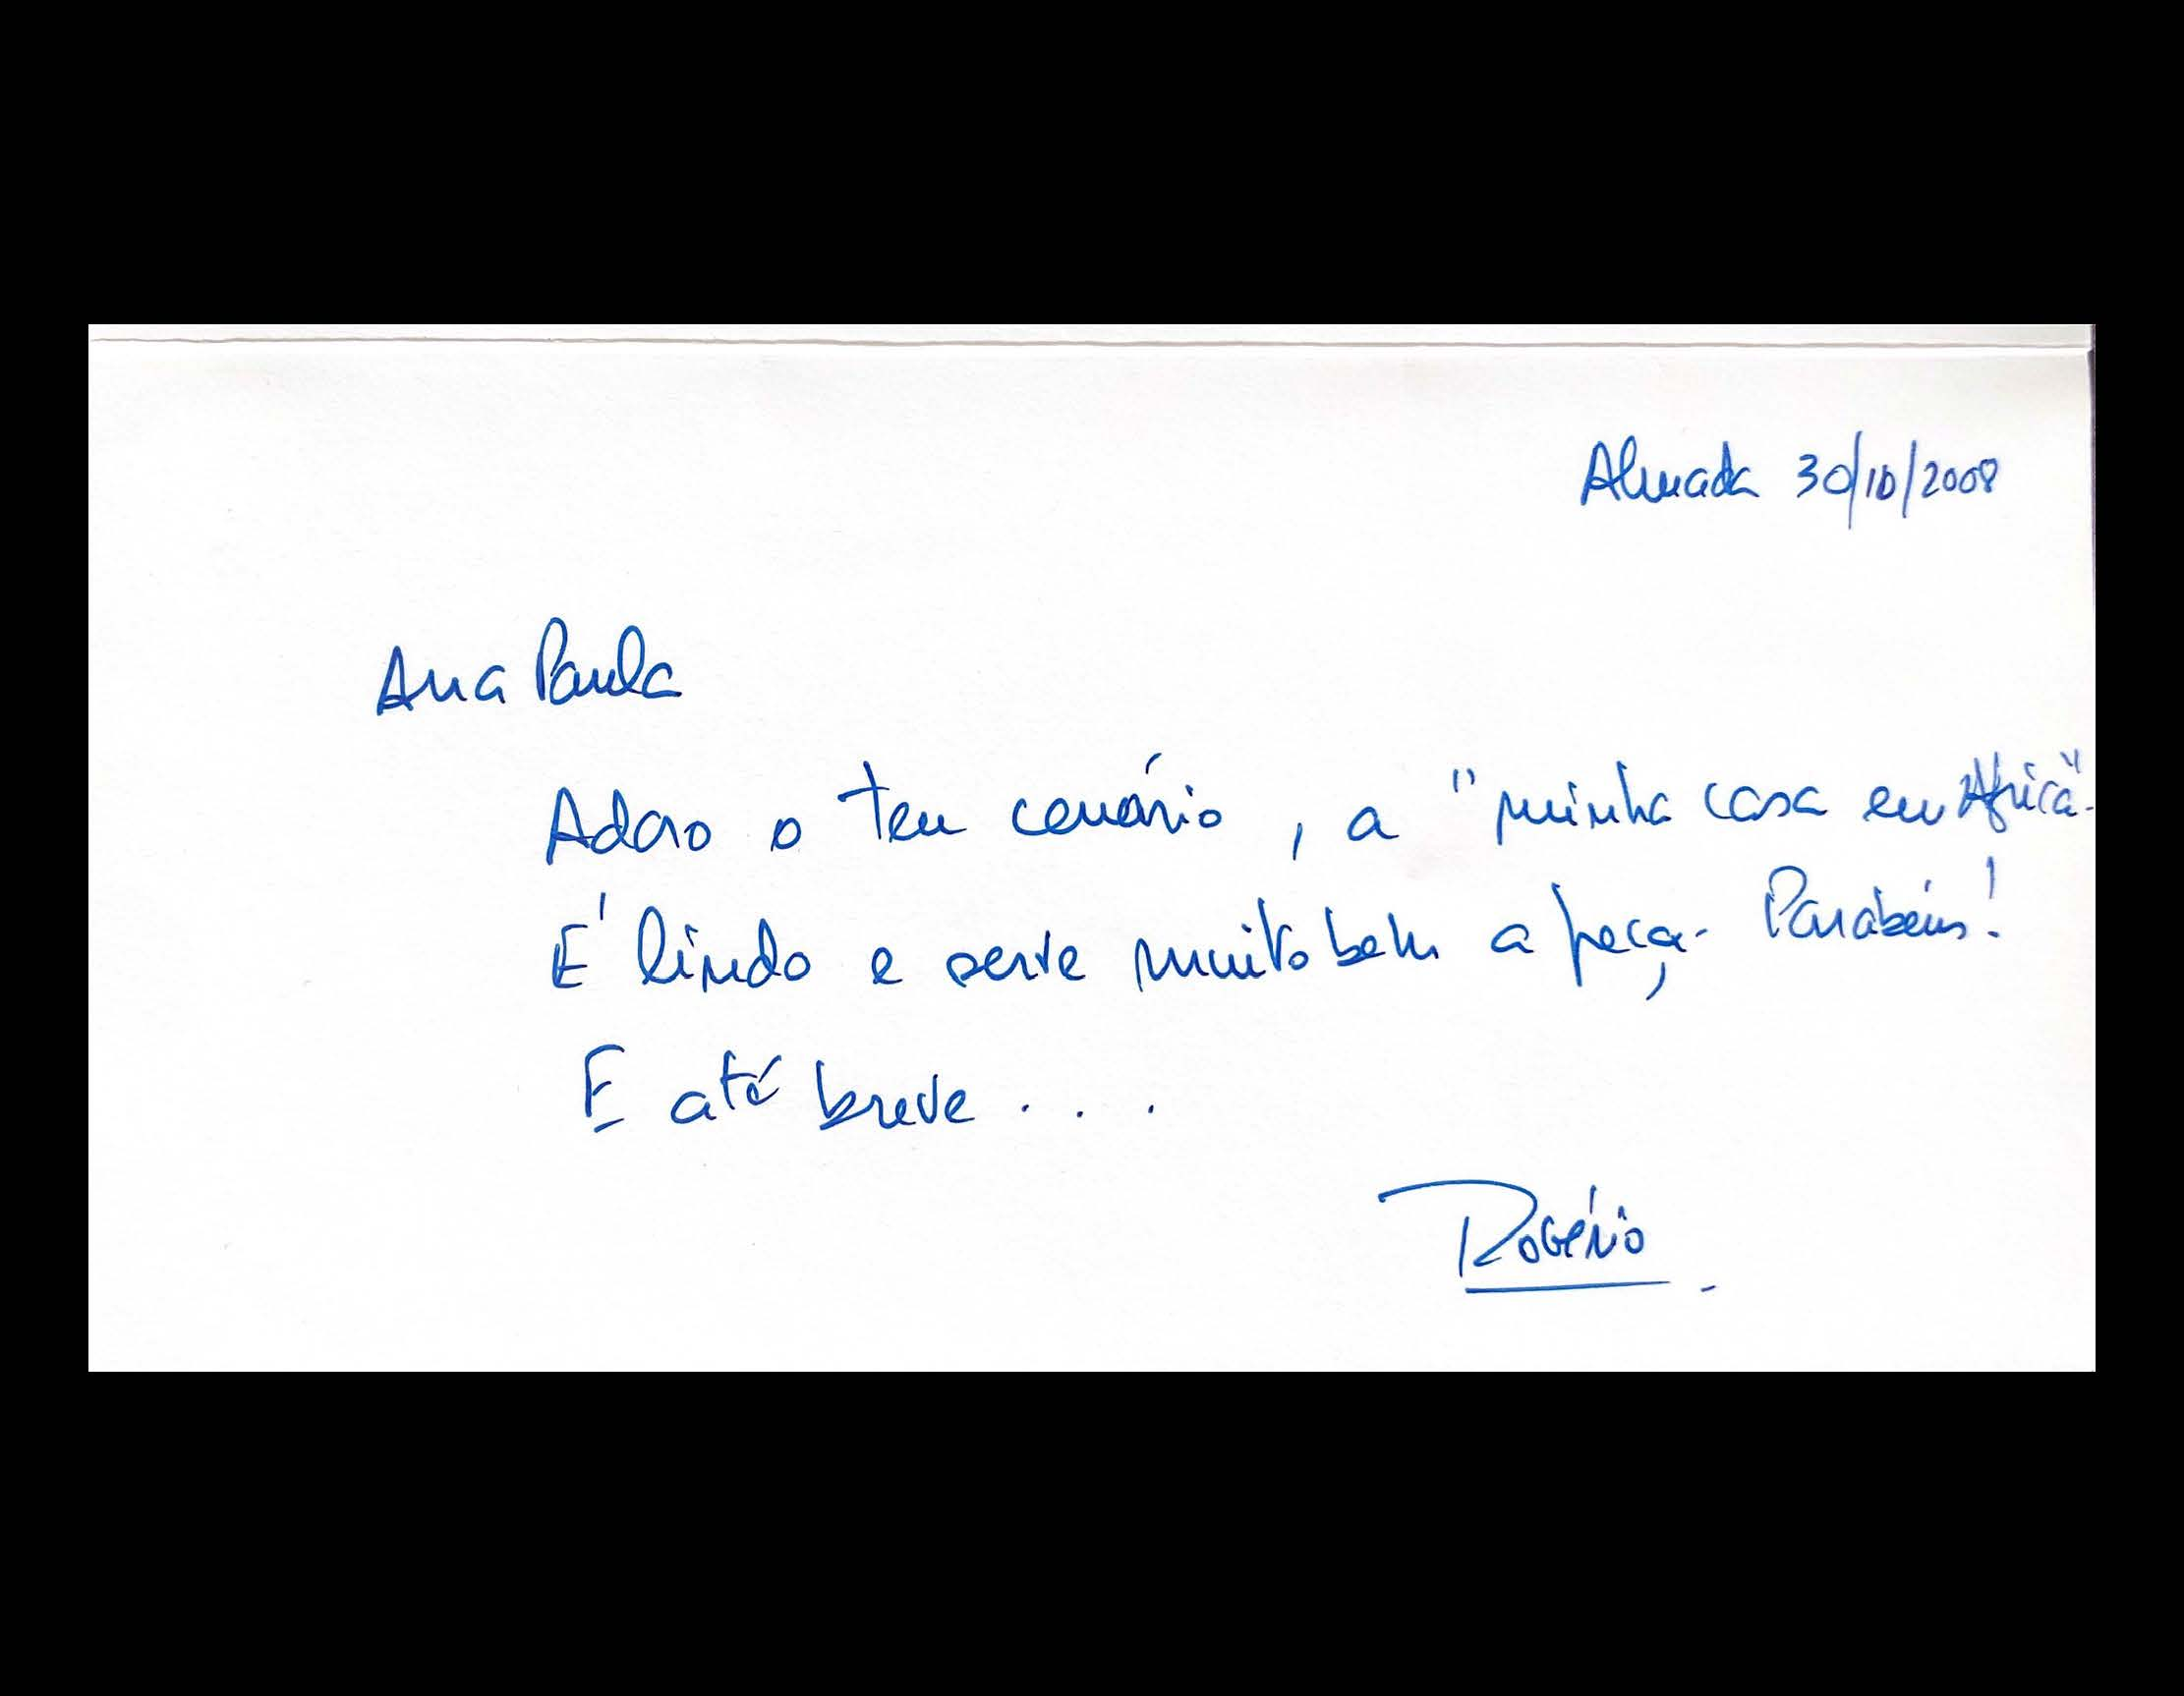 Ana Paula Rocha - Testemunhos - 010